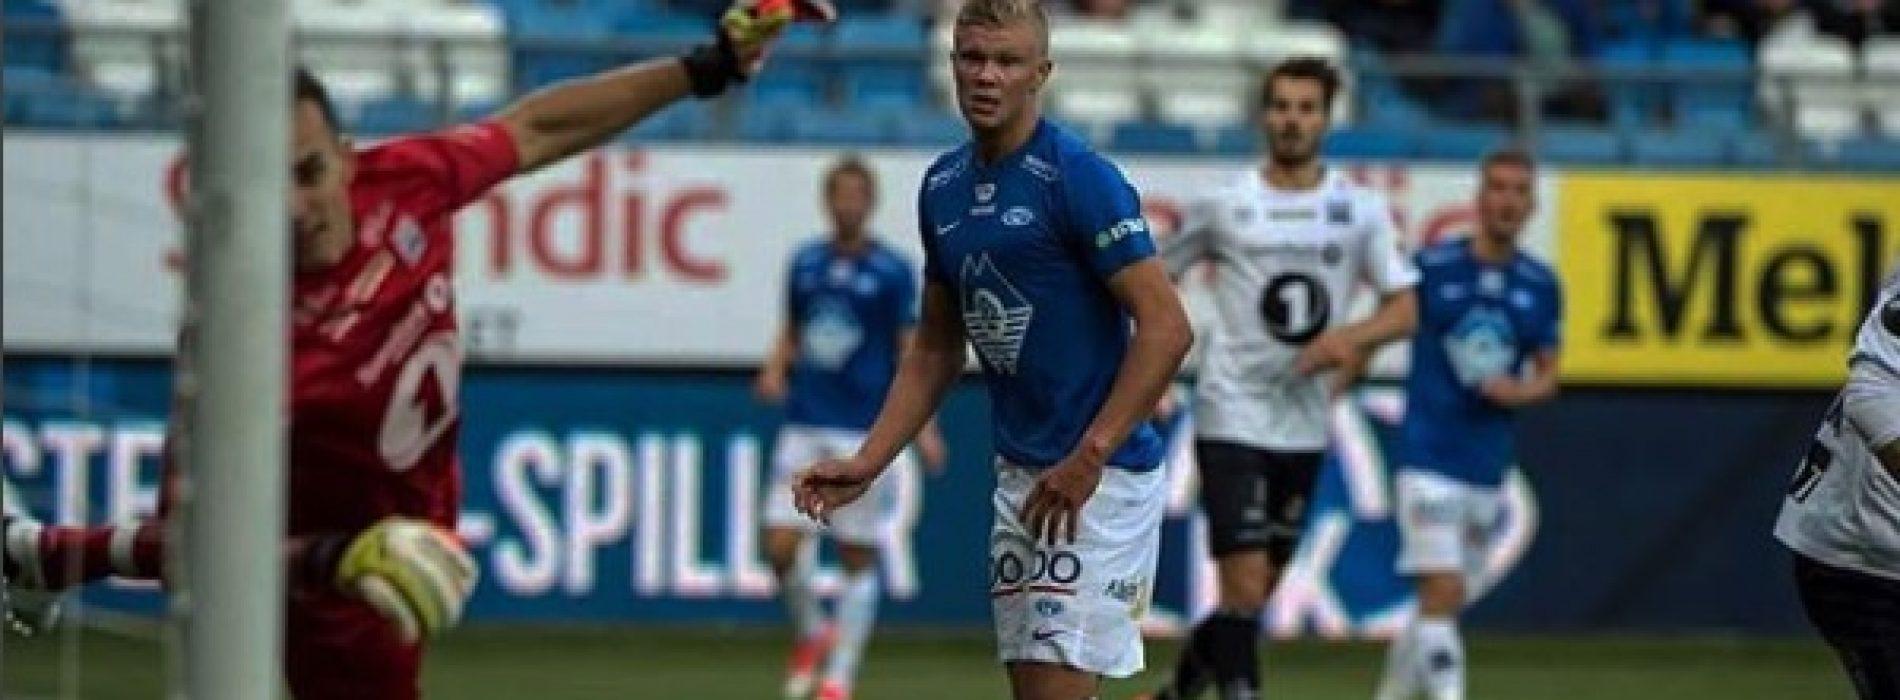 Juventus assalto ad Håland: pronti 100 milioni